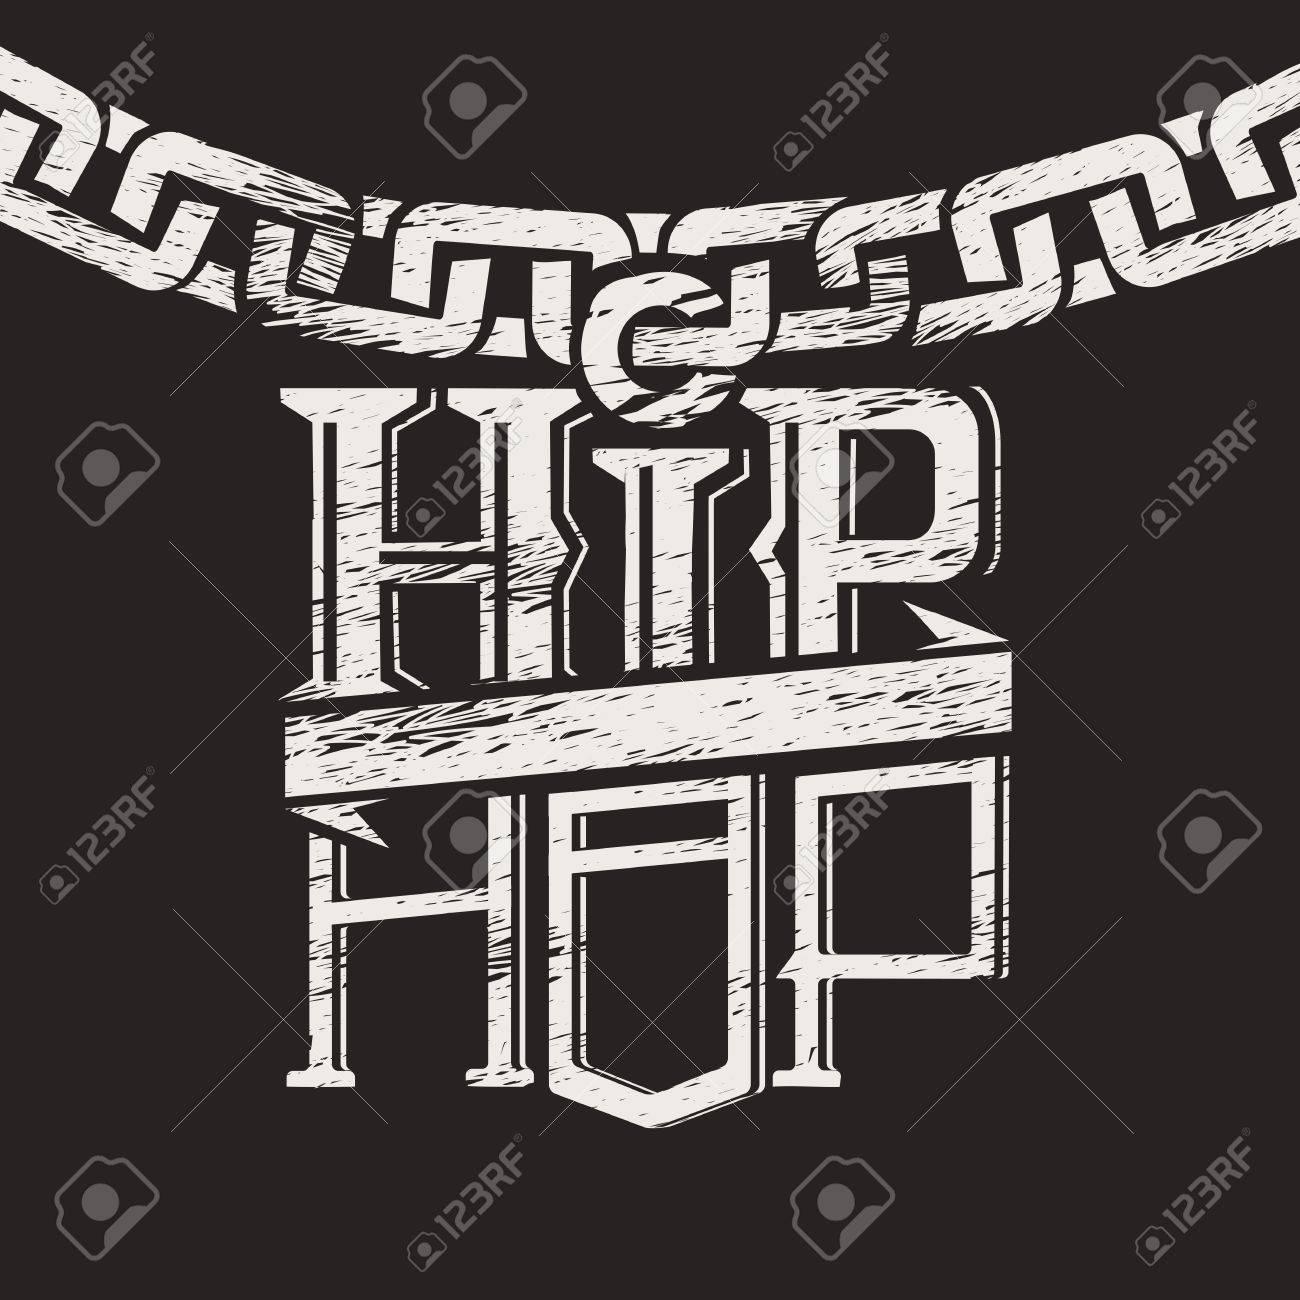 hip hop clipart.html